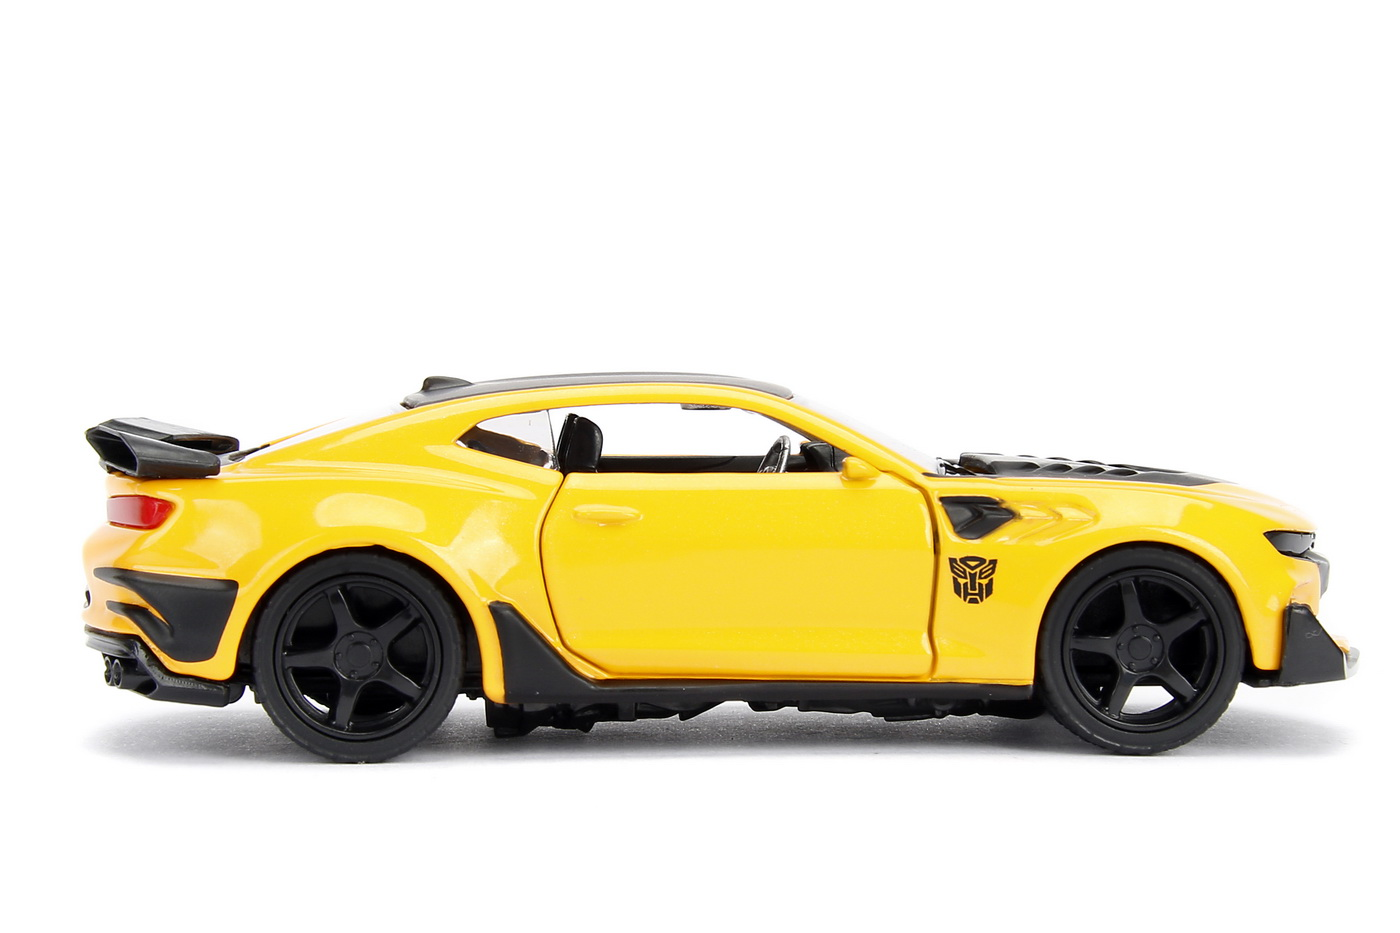 Masinuta Metalica Transformers 2016 Chevy Camaro Scara 1 La 32   JadaToys - 4